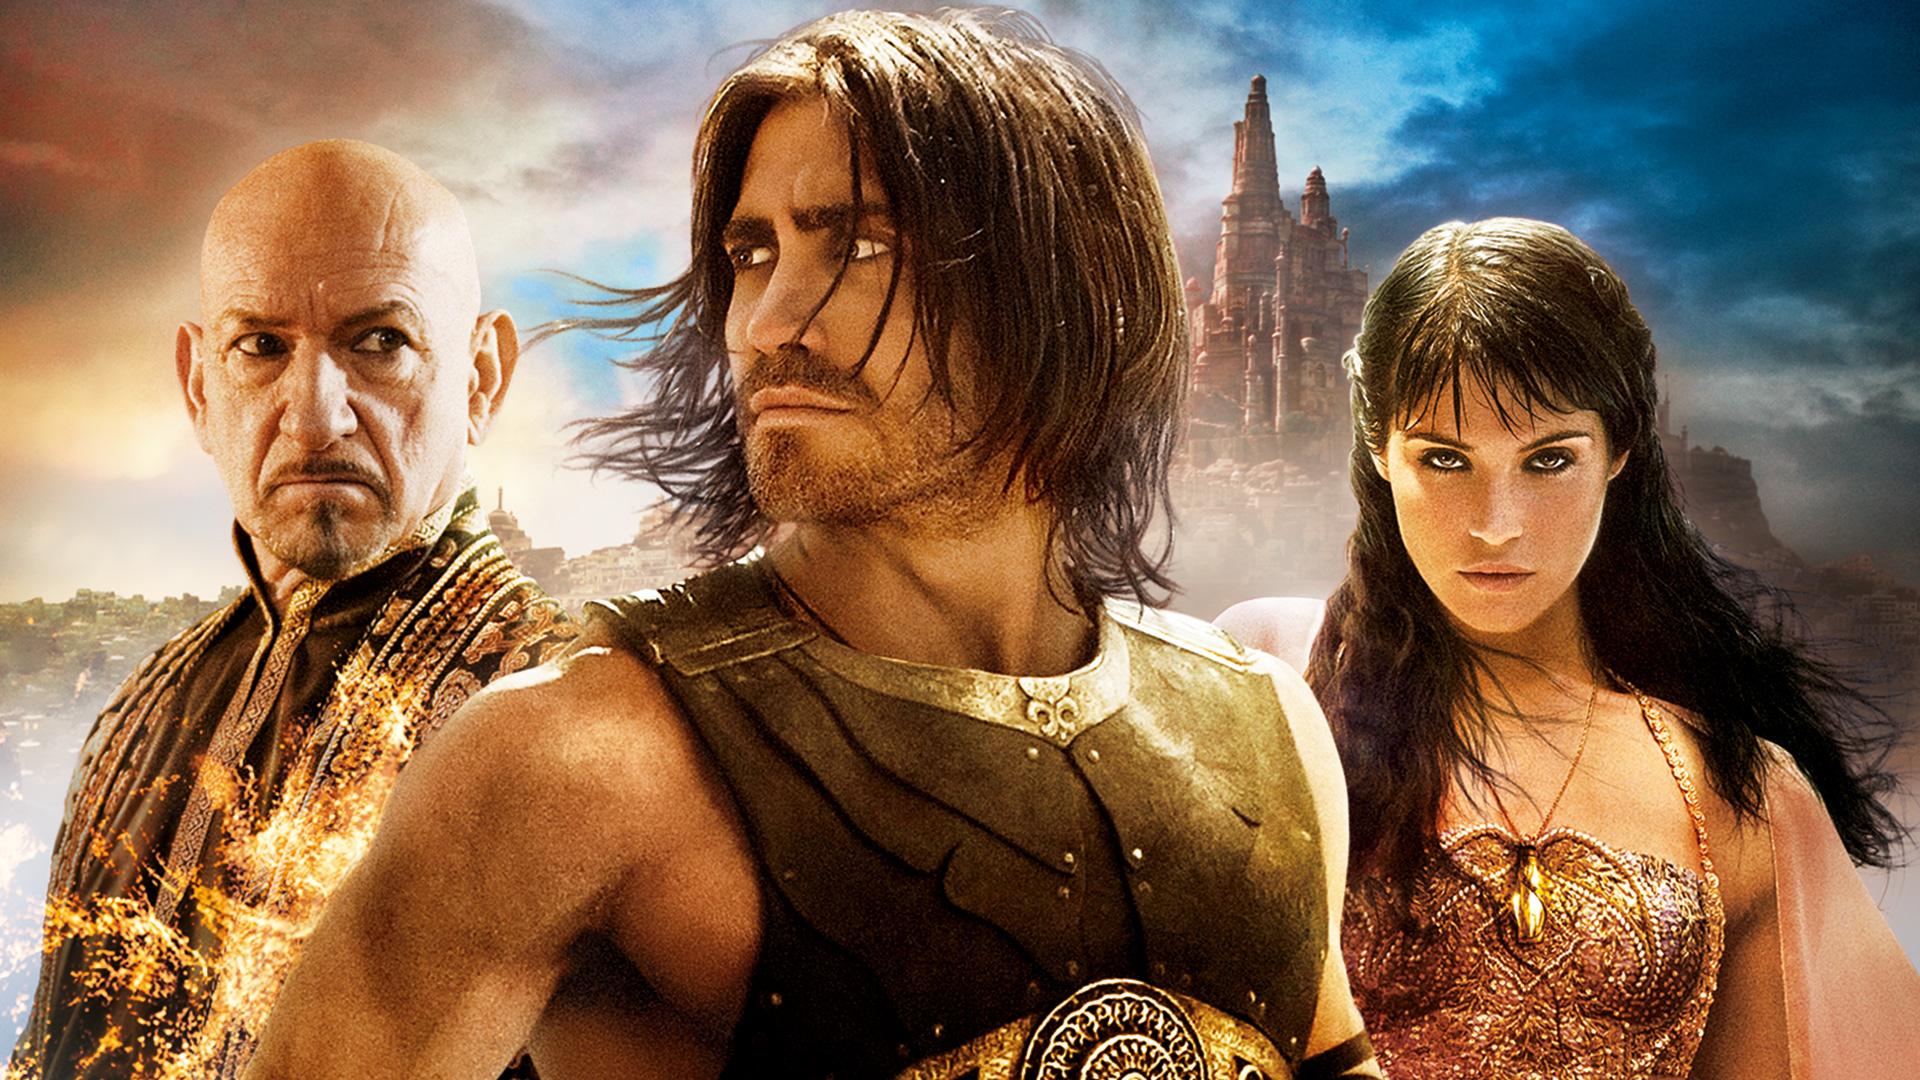 prince of persia movie watch free